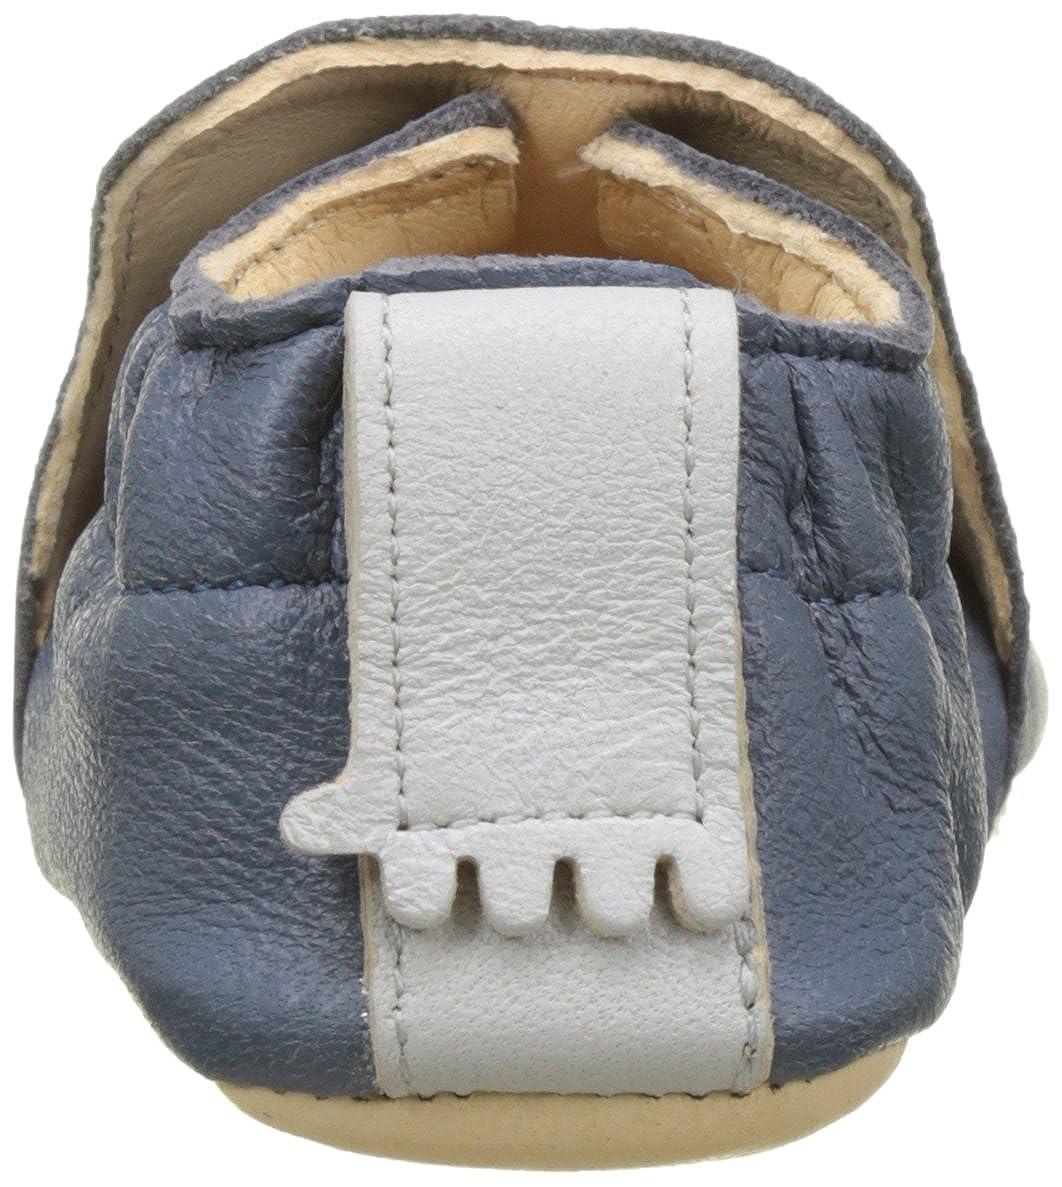 Easy Peasy Unisex Babies/' Blumoo Etoile Slippers